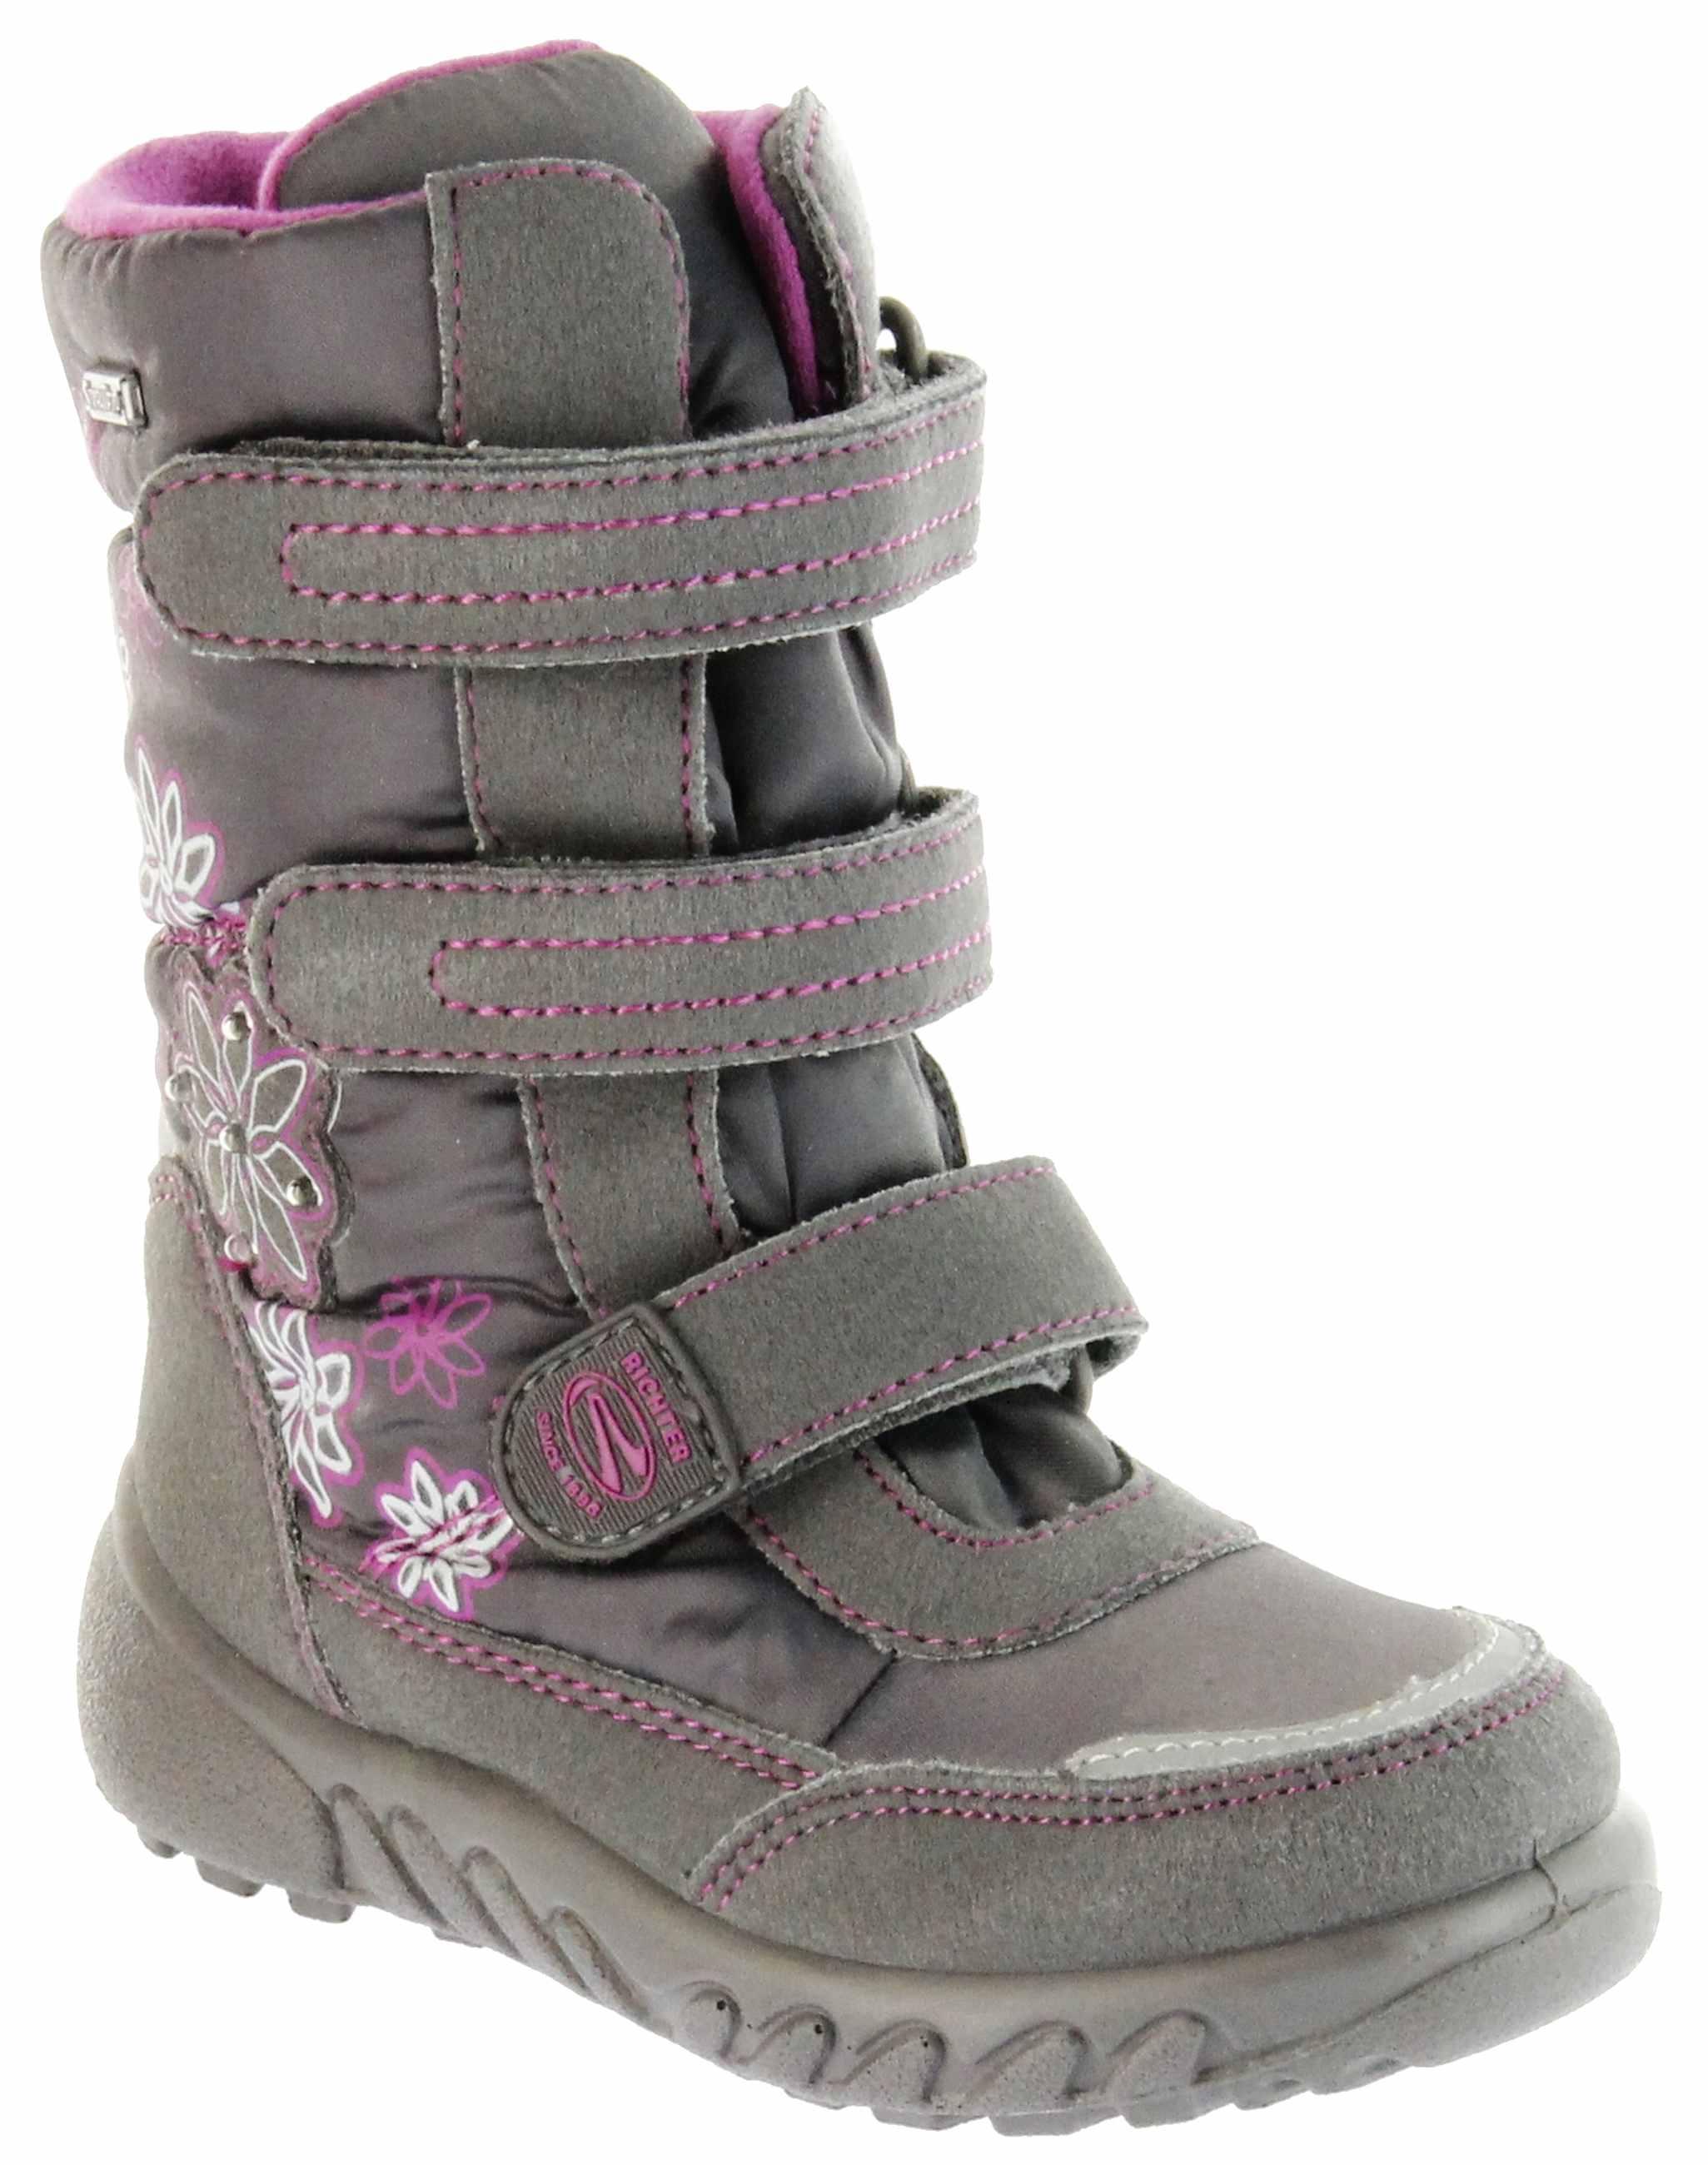 save off 5c4bf 174bc Richter Kinder Winter Boots Stiefel grau Warmfutter SympaTex Mädchen  Blinkie 5151-831-6501 steel Husky WMS